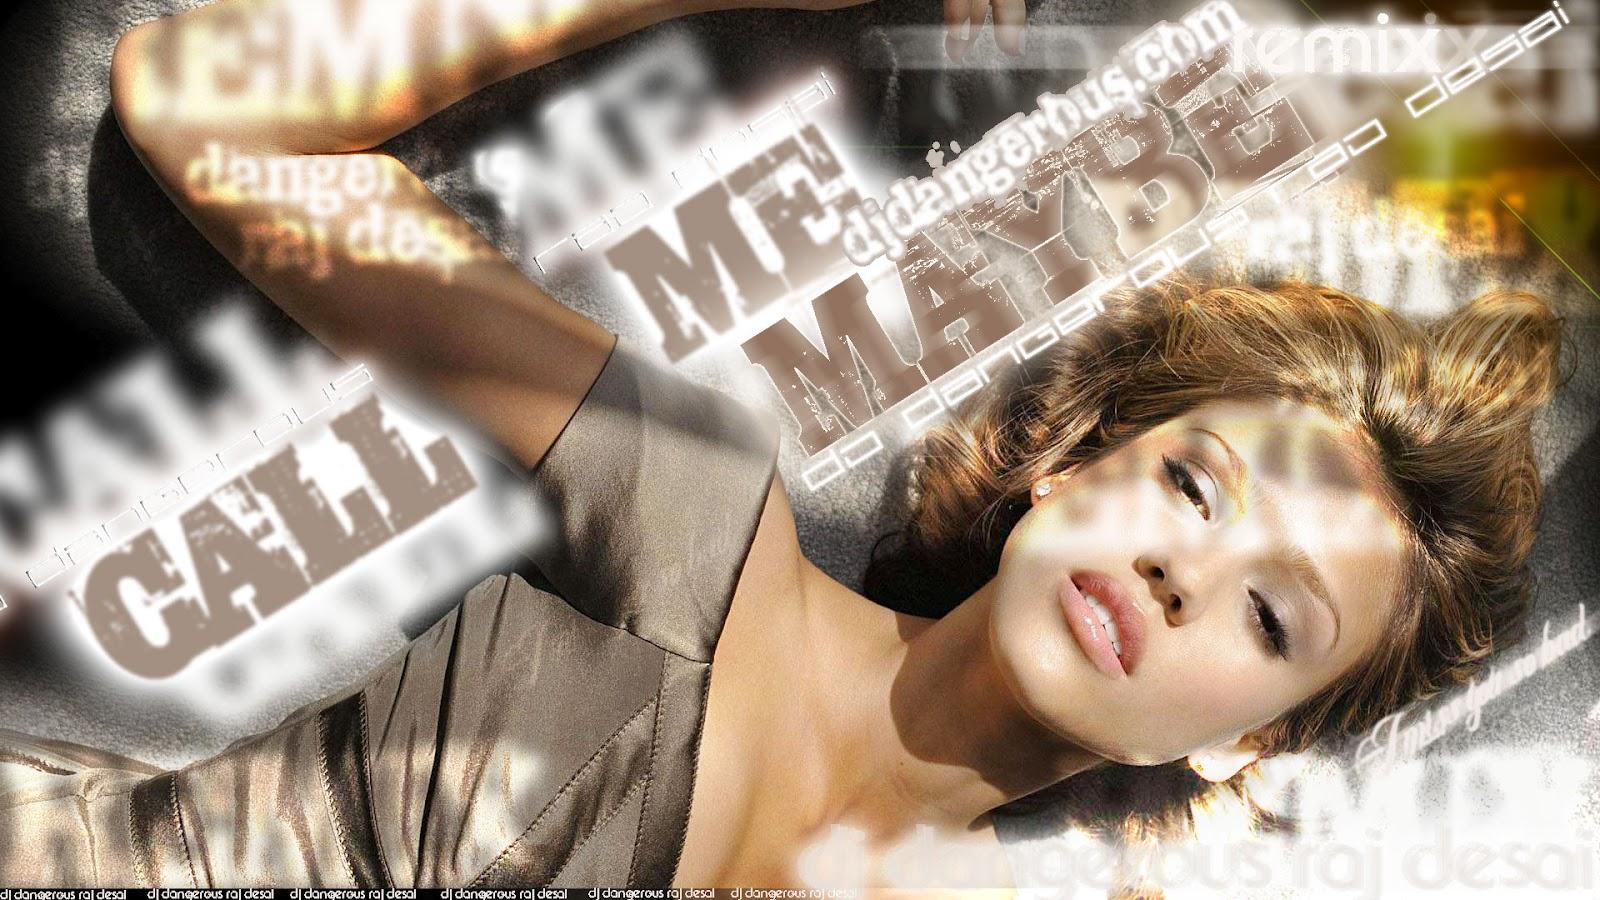 Call Me Maybe Lyrics Music Video Remix Carly Rae Jepsen